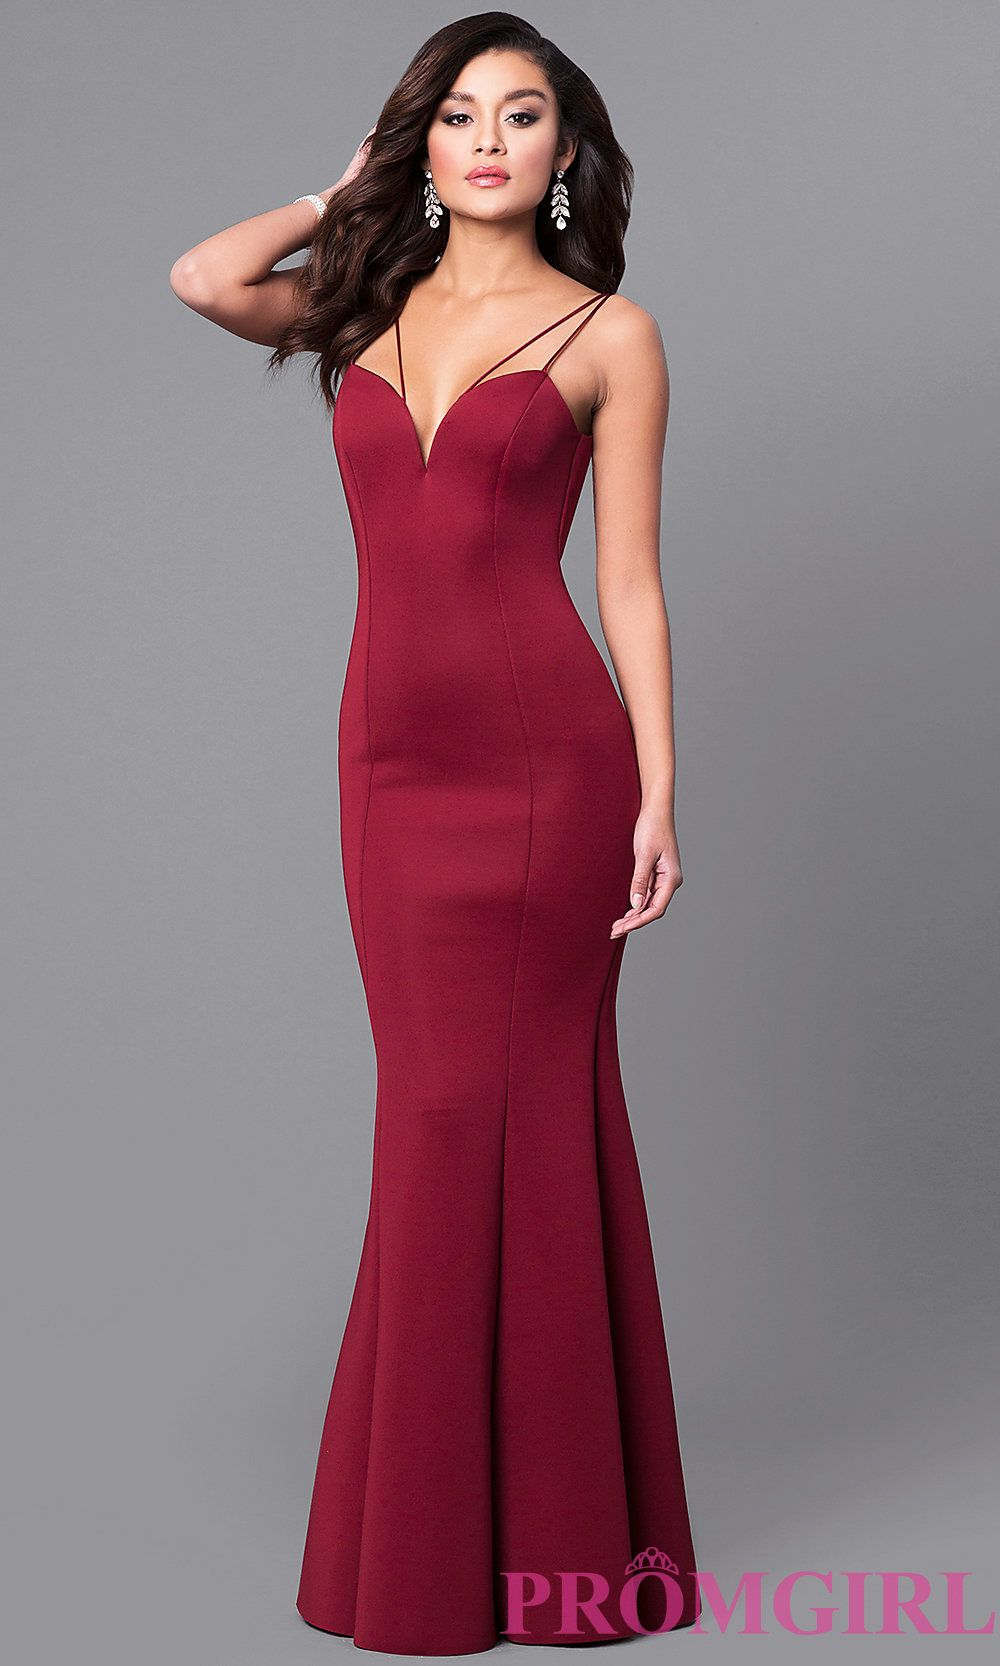 Long Prom Dress With Sweetheart Deep V Neckline Cheap Prom Dresses Long Prom Dresses Long Mermaid Long Mermaid Dress [ 1666 x 1000 Pixel ]